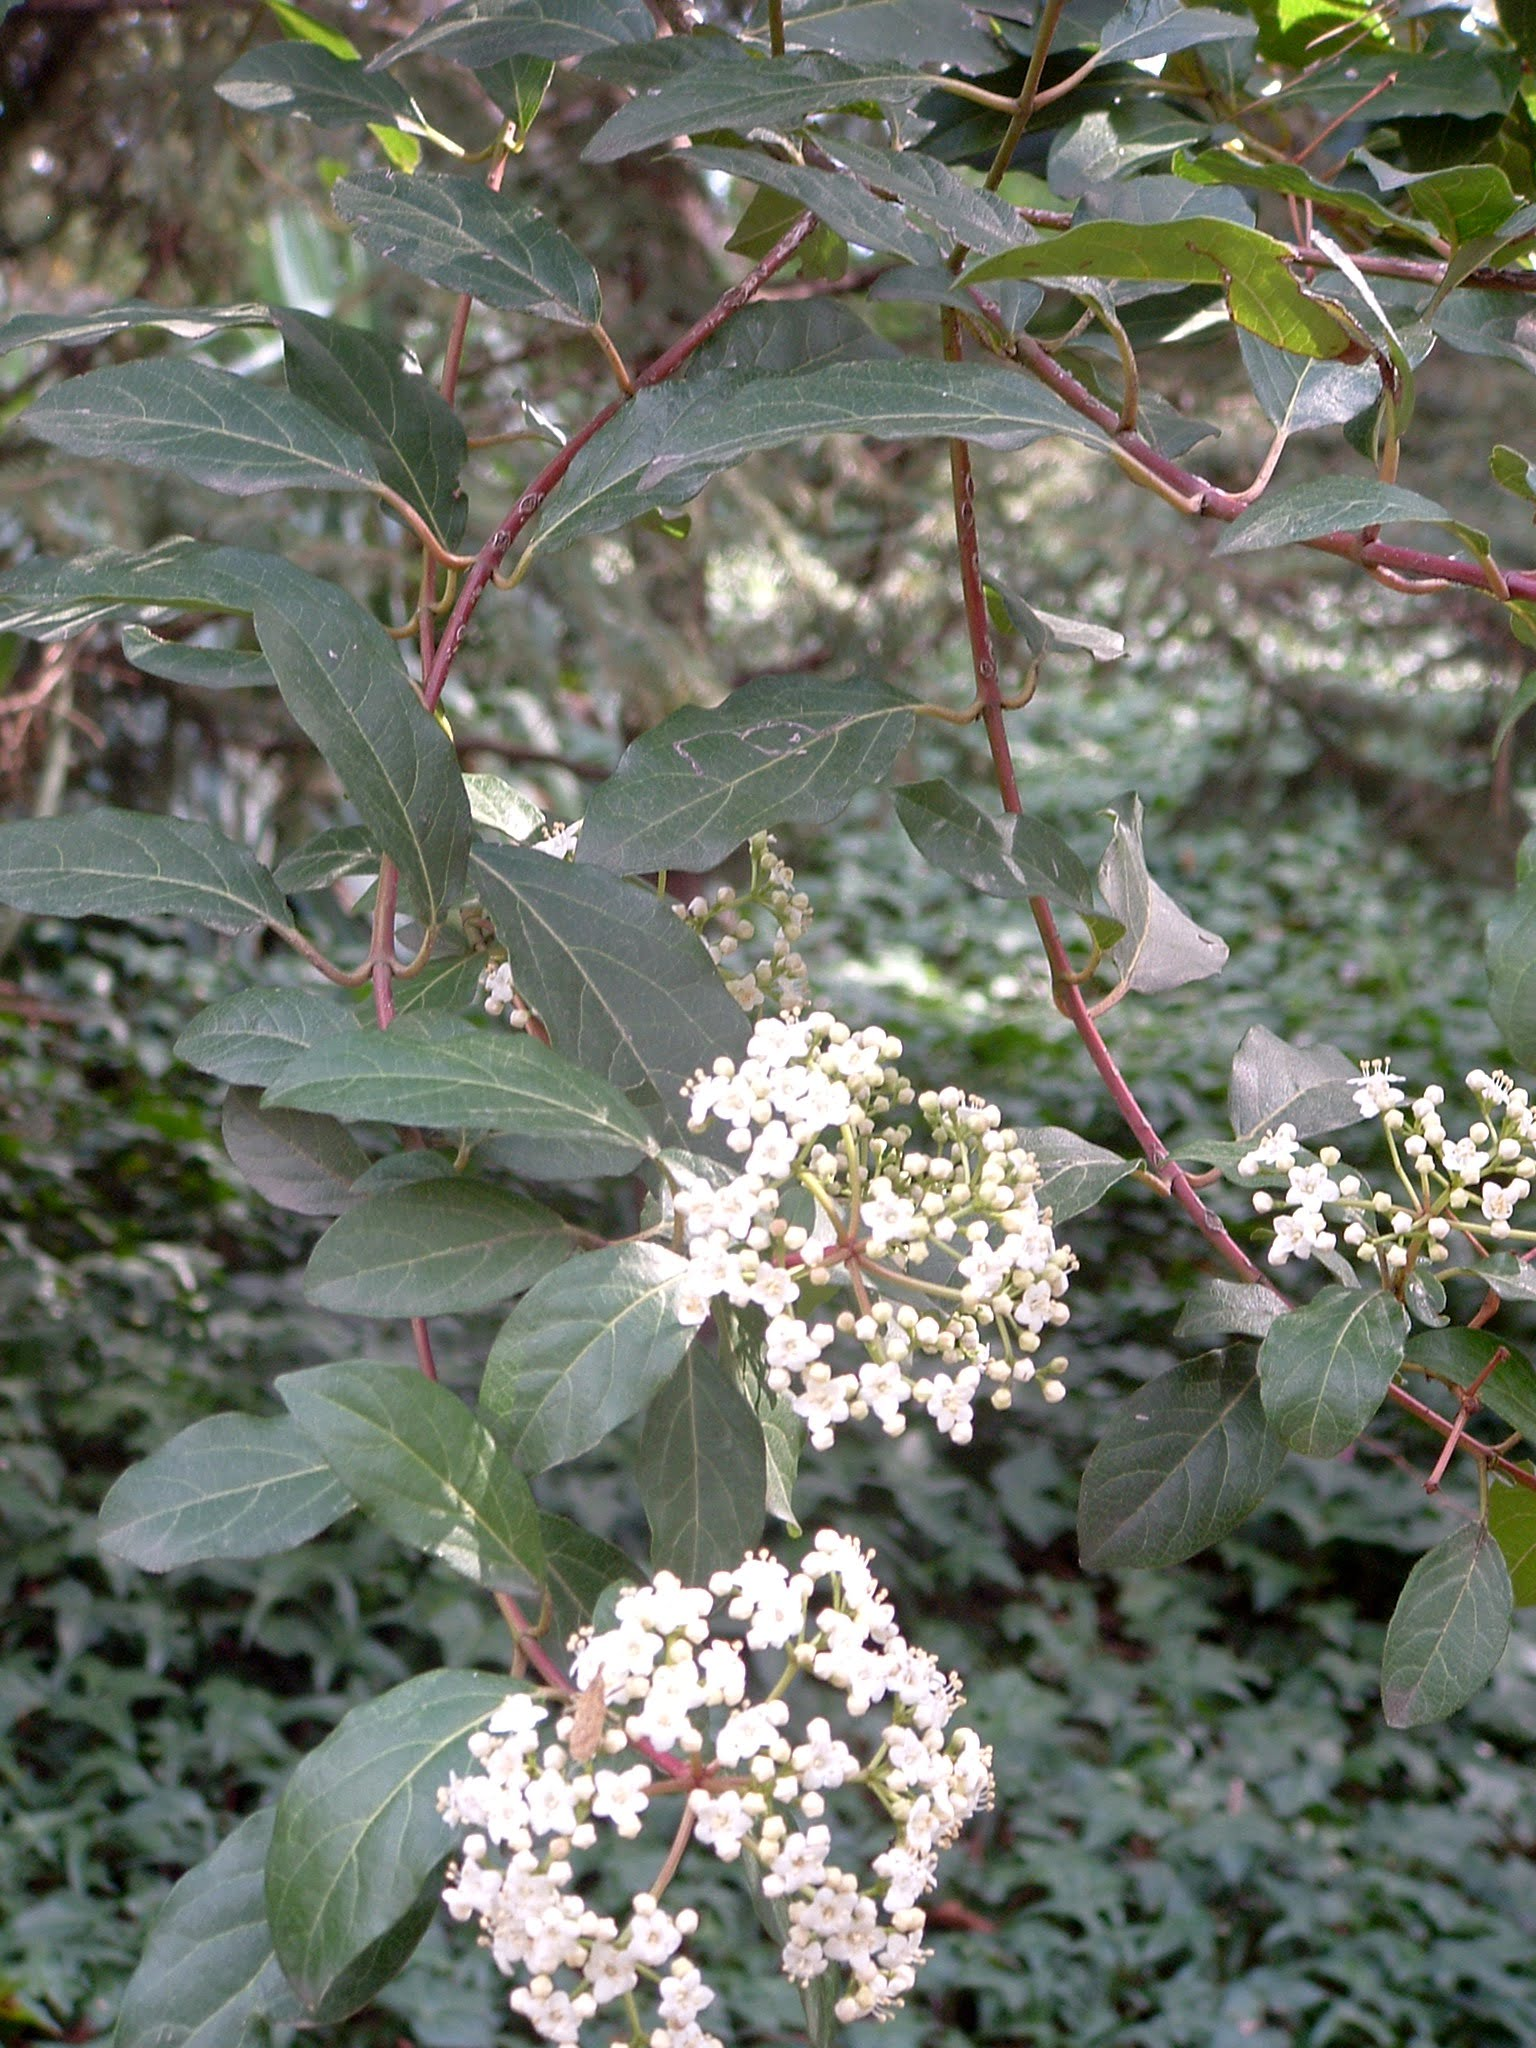 Viburnum tinus detalle de flor y hoja